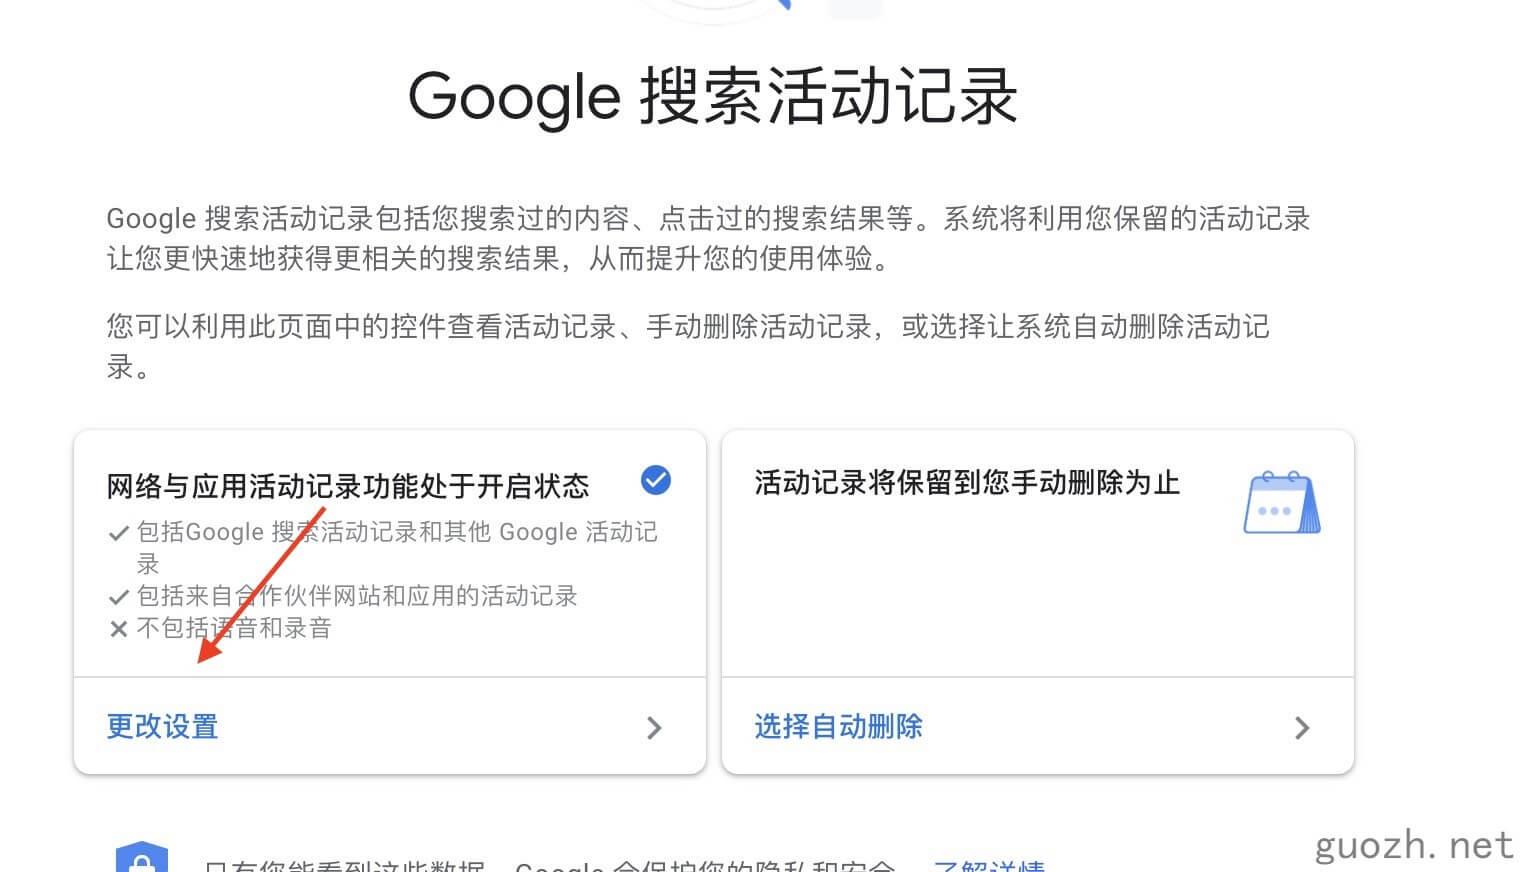 《Chrome 浏览器关闭搜索栏历史记录 取消自动联想记忆》